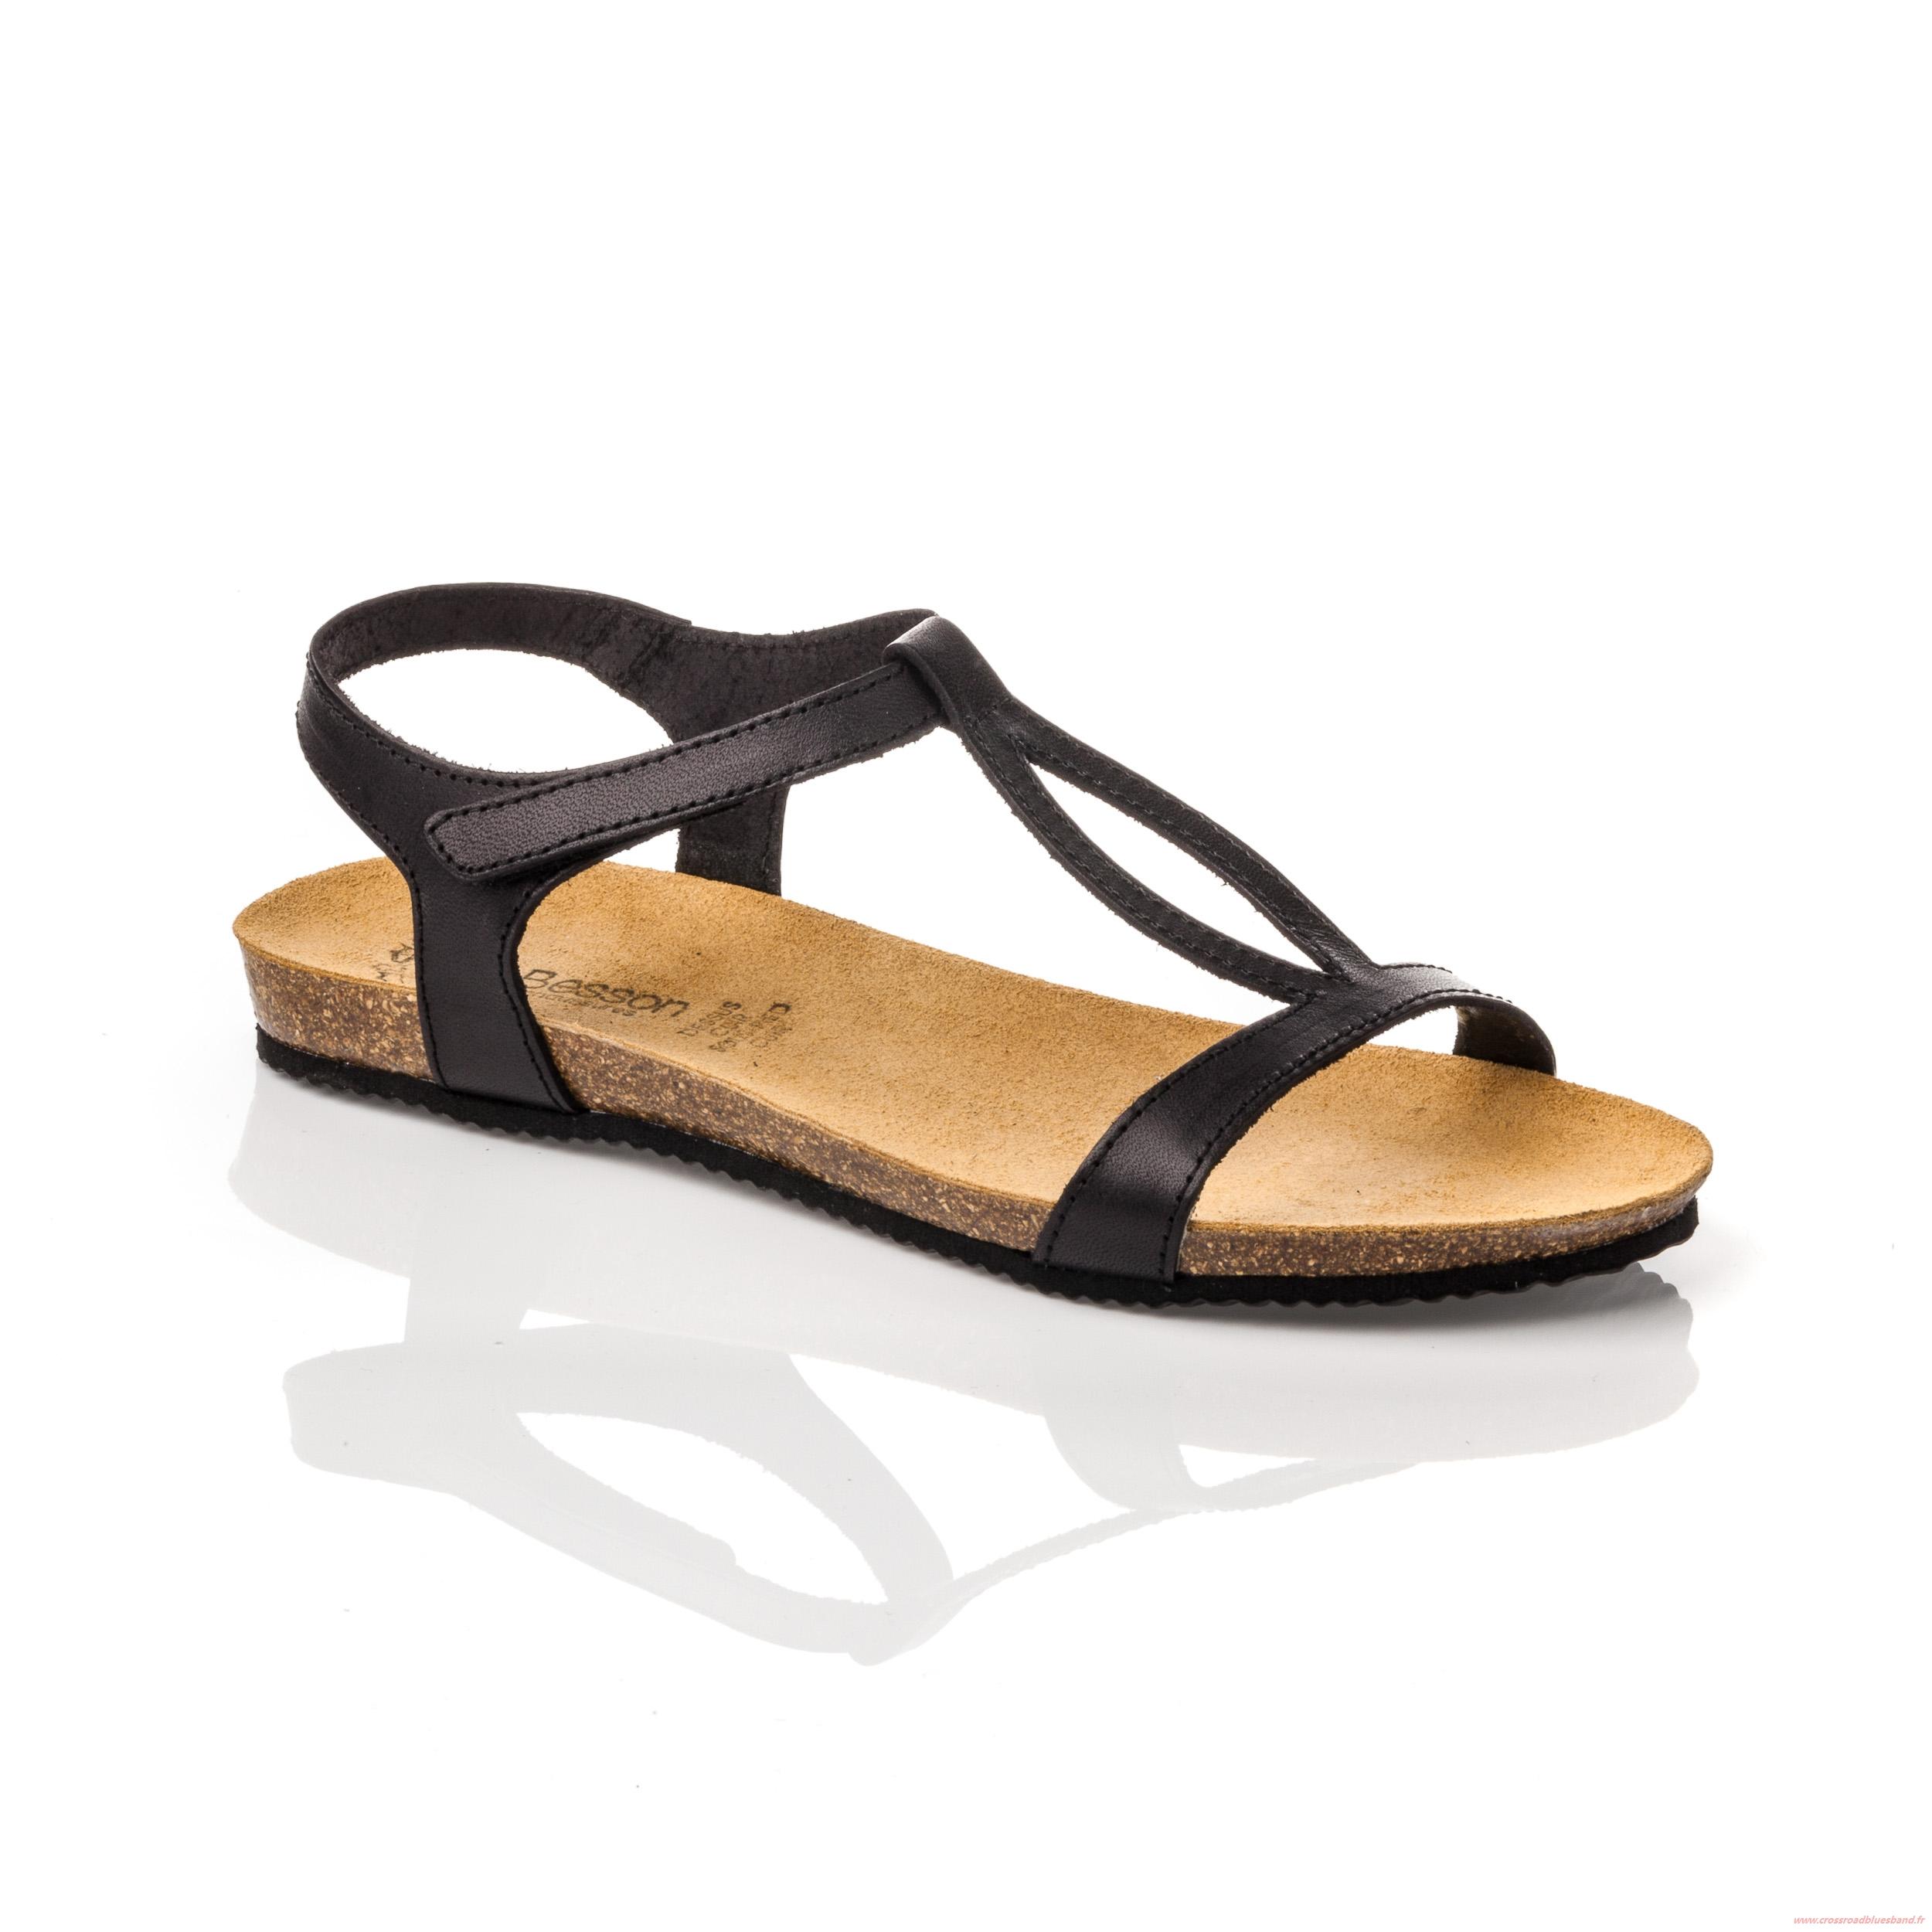 Sandale cuir femme besson